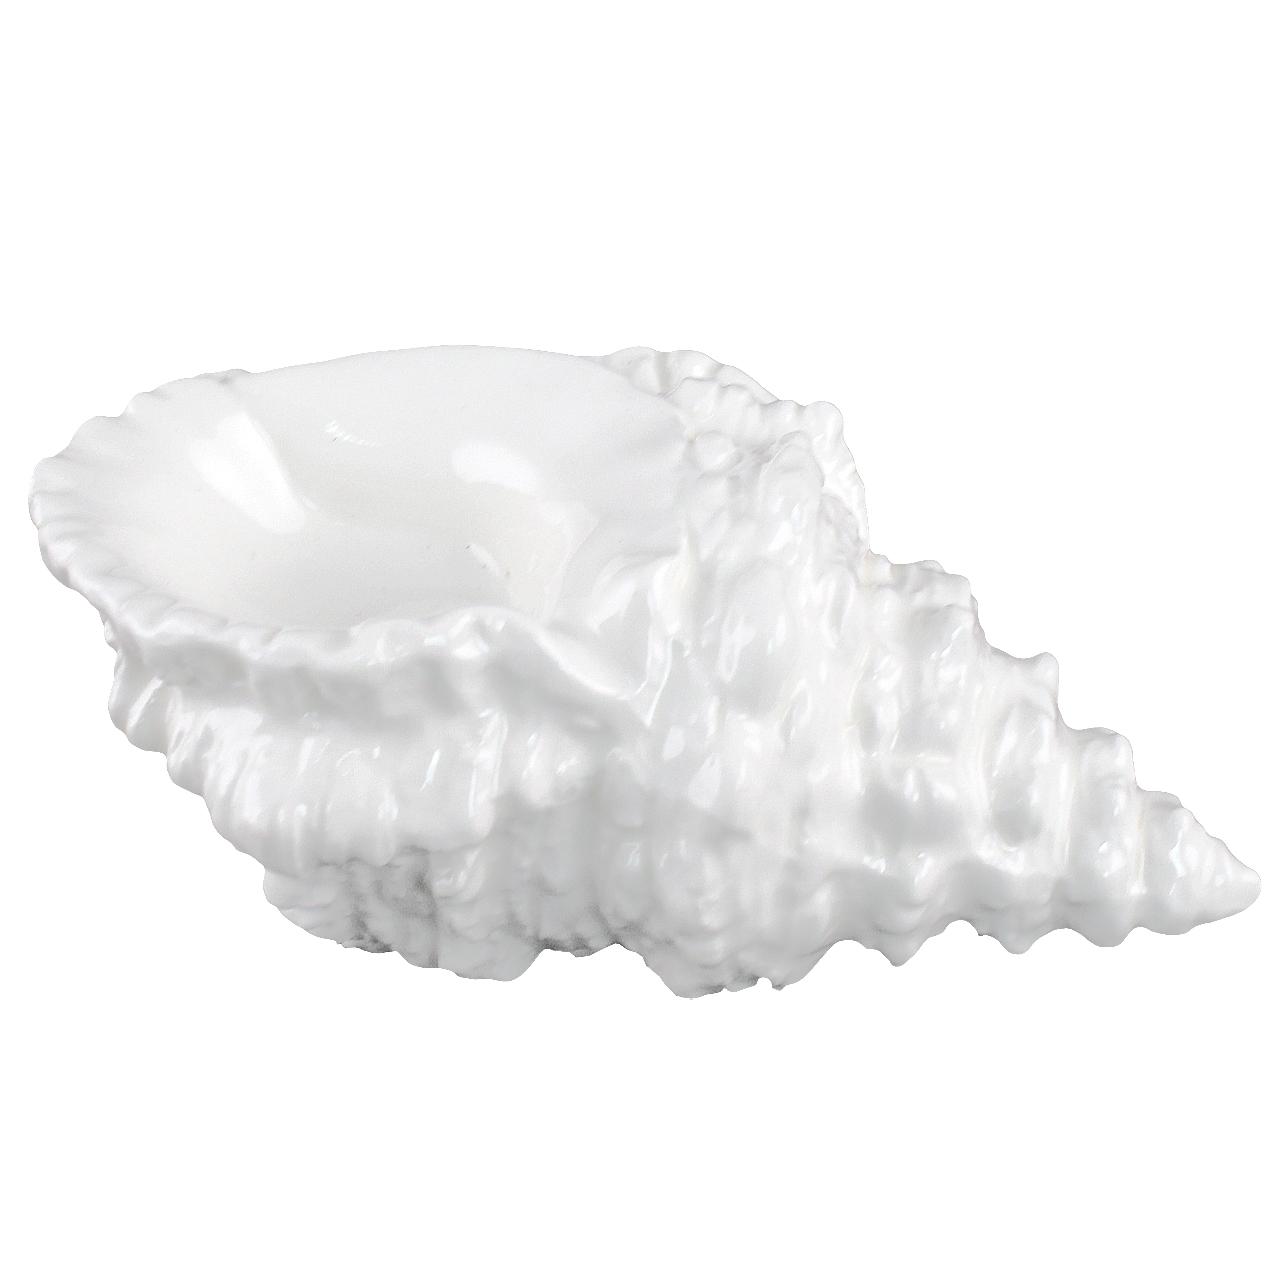 Decoratiune Scoica Din Ceramica 10 Cm